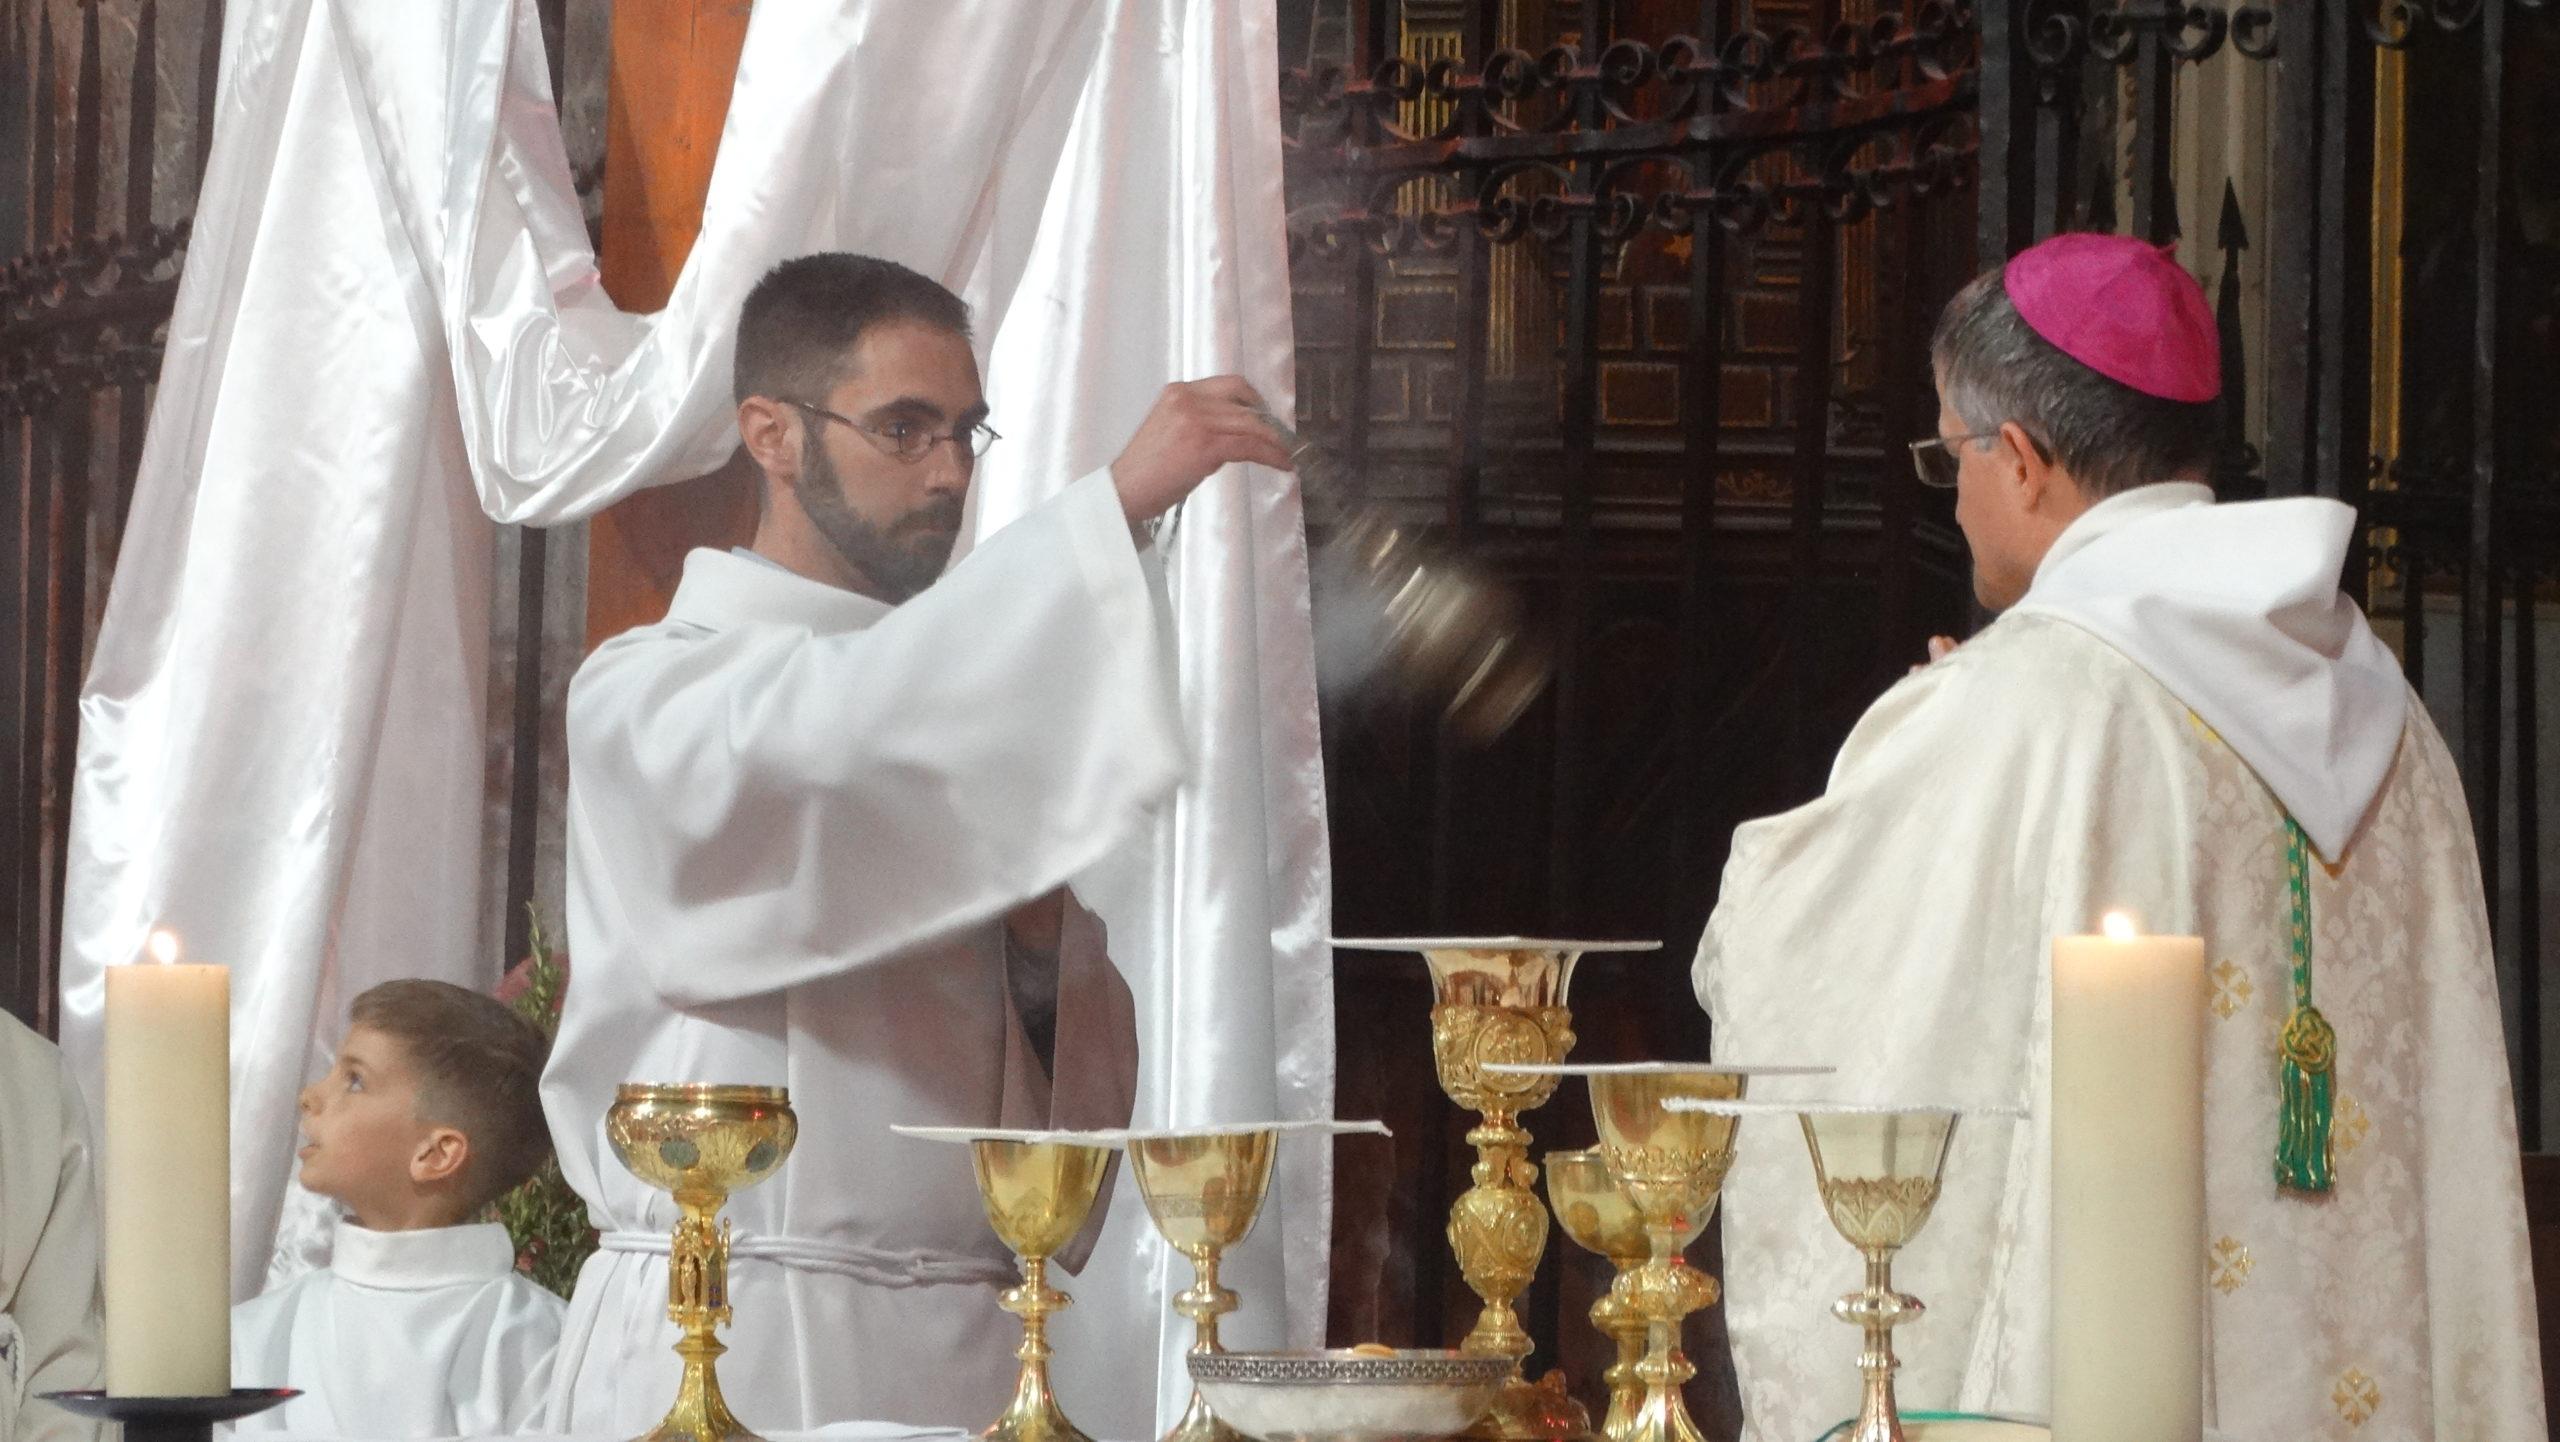 Ordination diaconale de Thibaud Varis